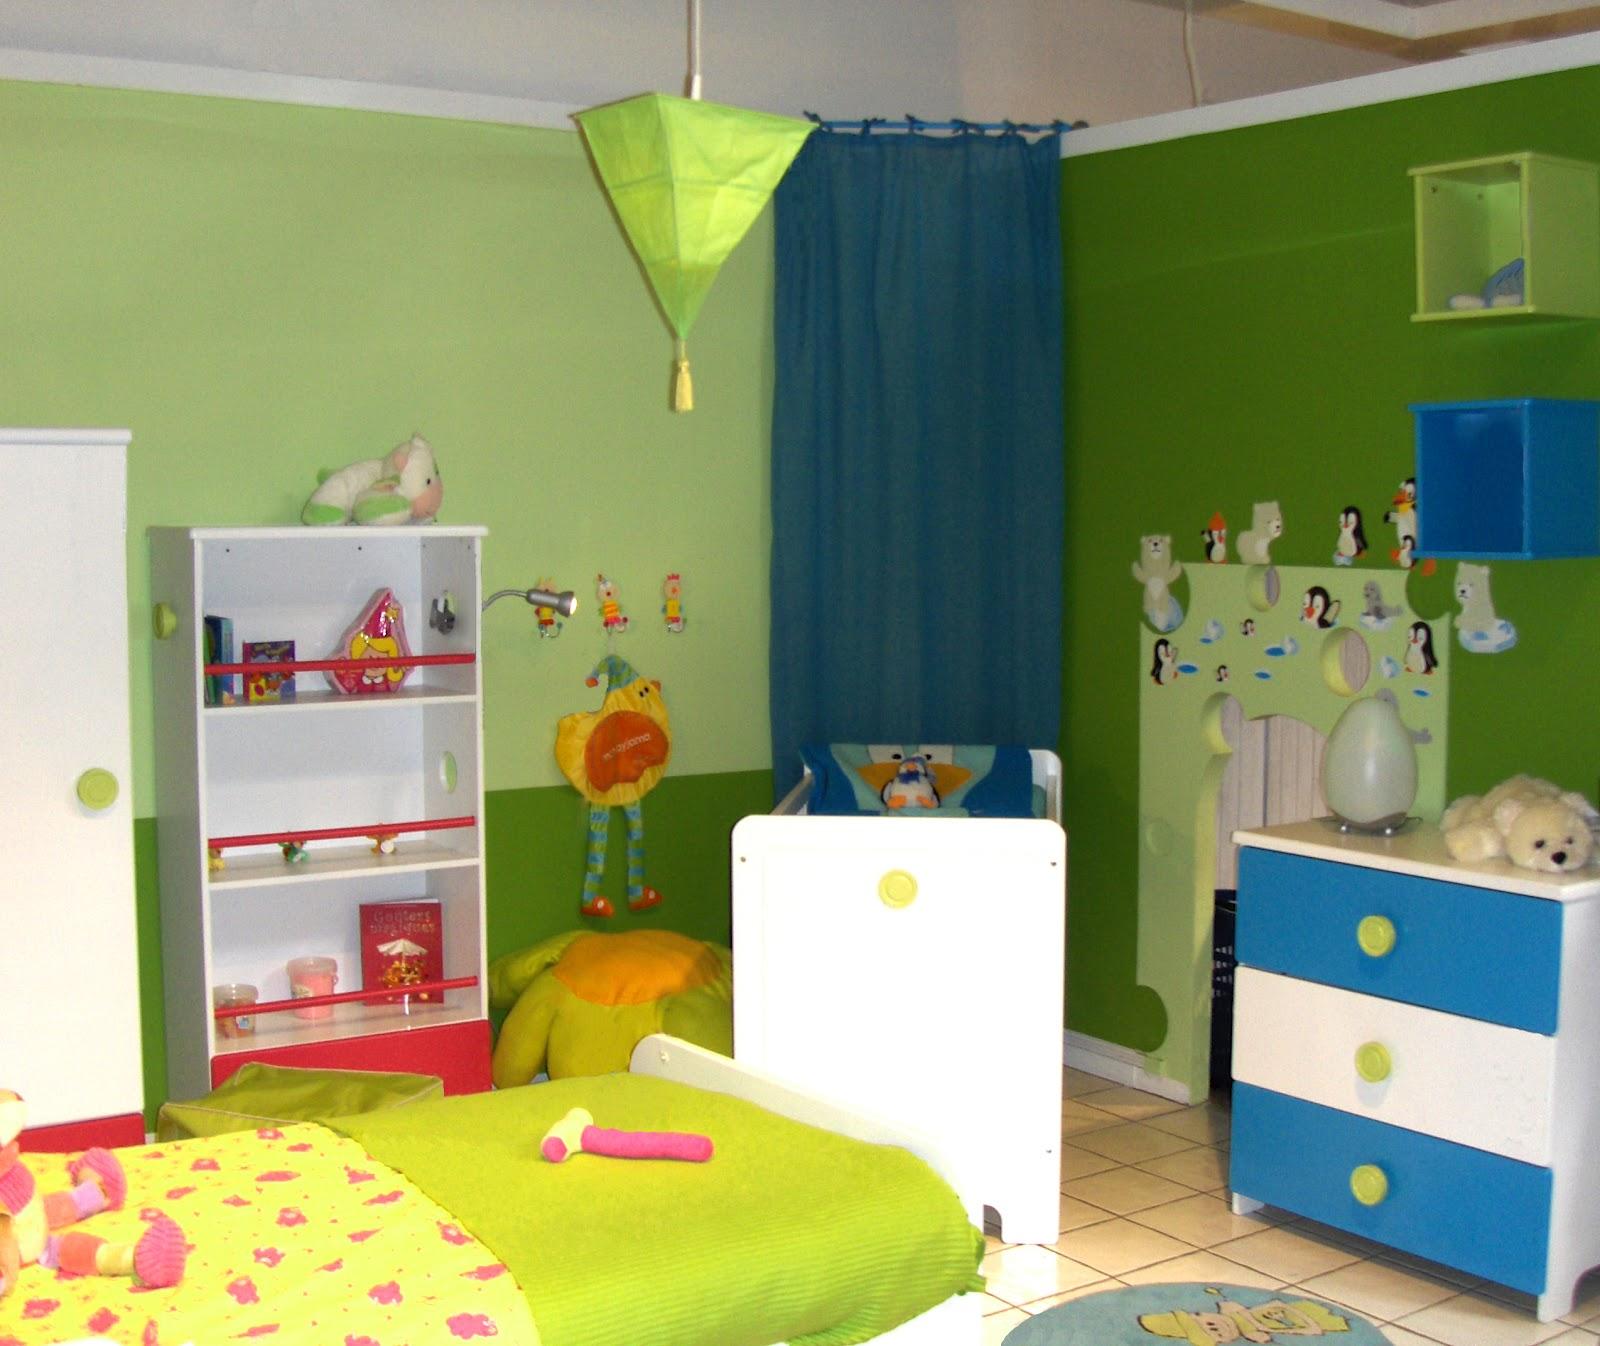 emejing decoration chambre garcon 3 ans images. Black Bedroom Furniture Sets. Home Design Ideas